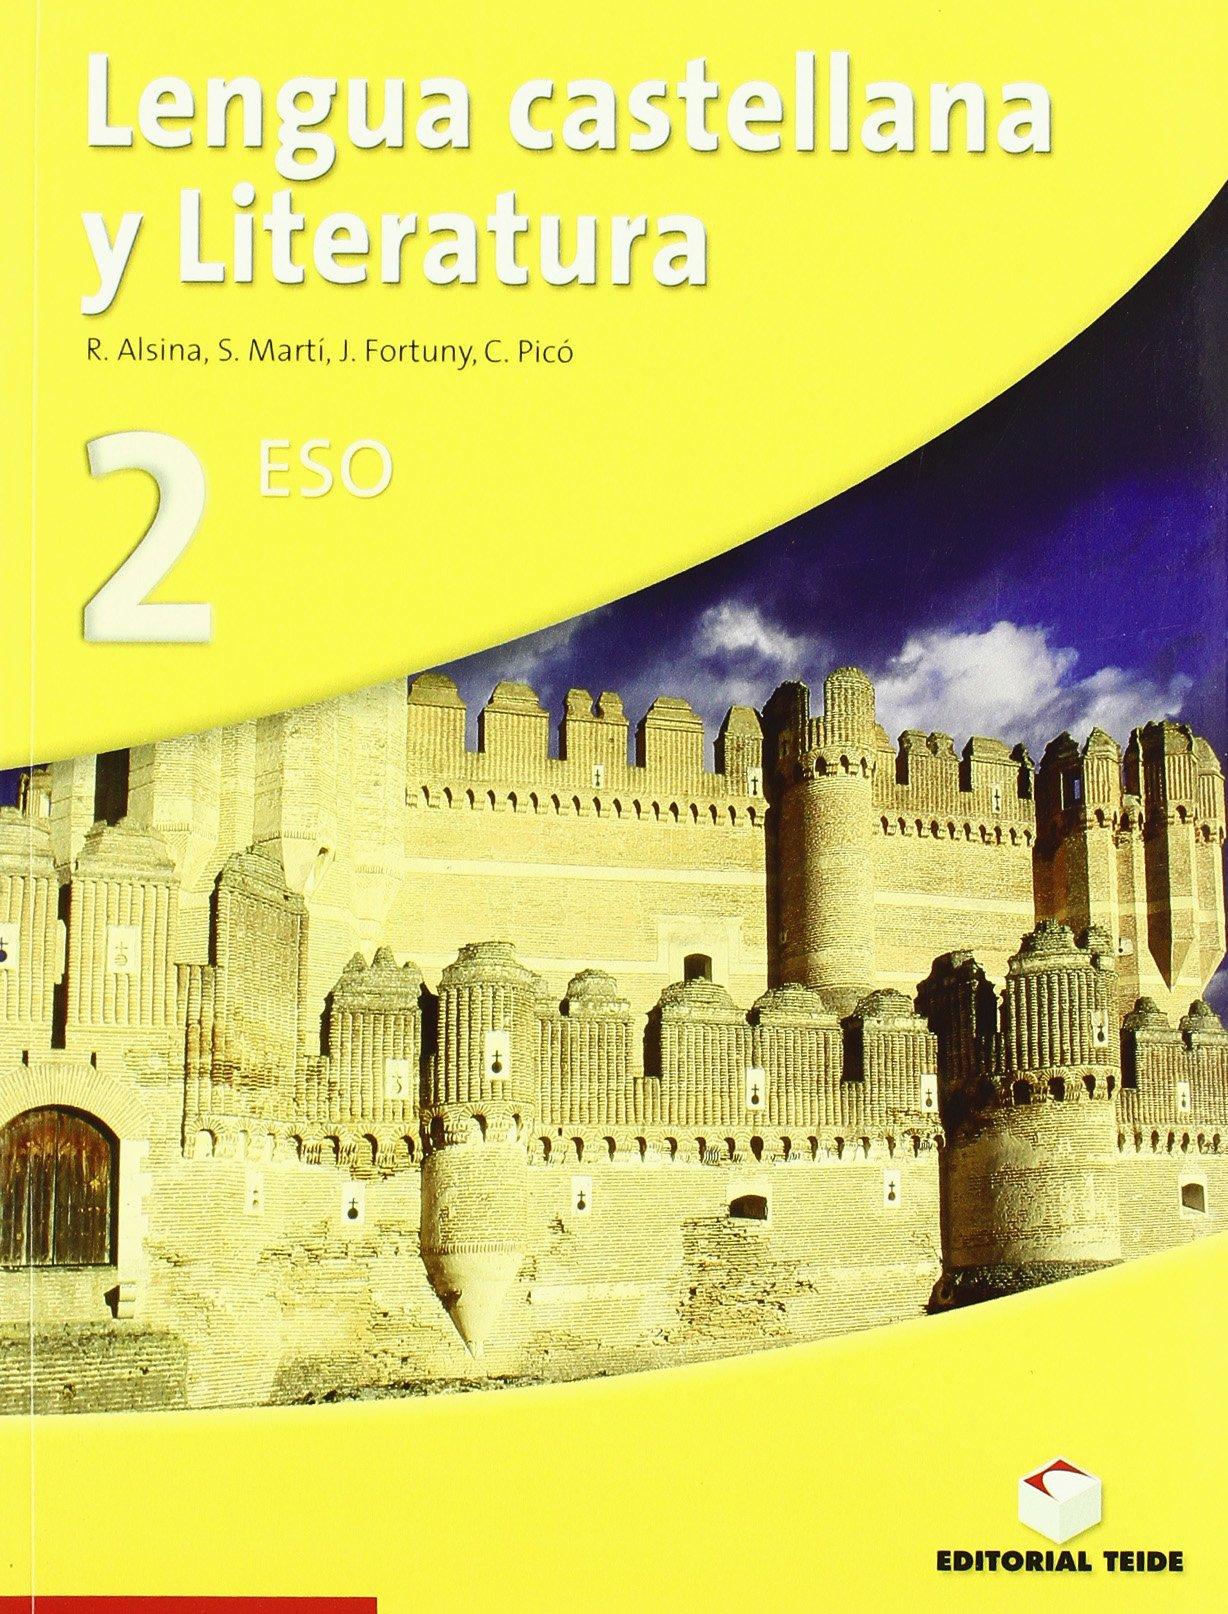 Lengua castellana y literatura, 2 ESO - 9788430786527: Amazon.es: Alsina Soriano, Rosa, Fortuny Giné, Joan Baptista, Picó Llorca, Carme, Martí Raüll, Salvador: Libros